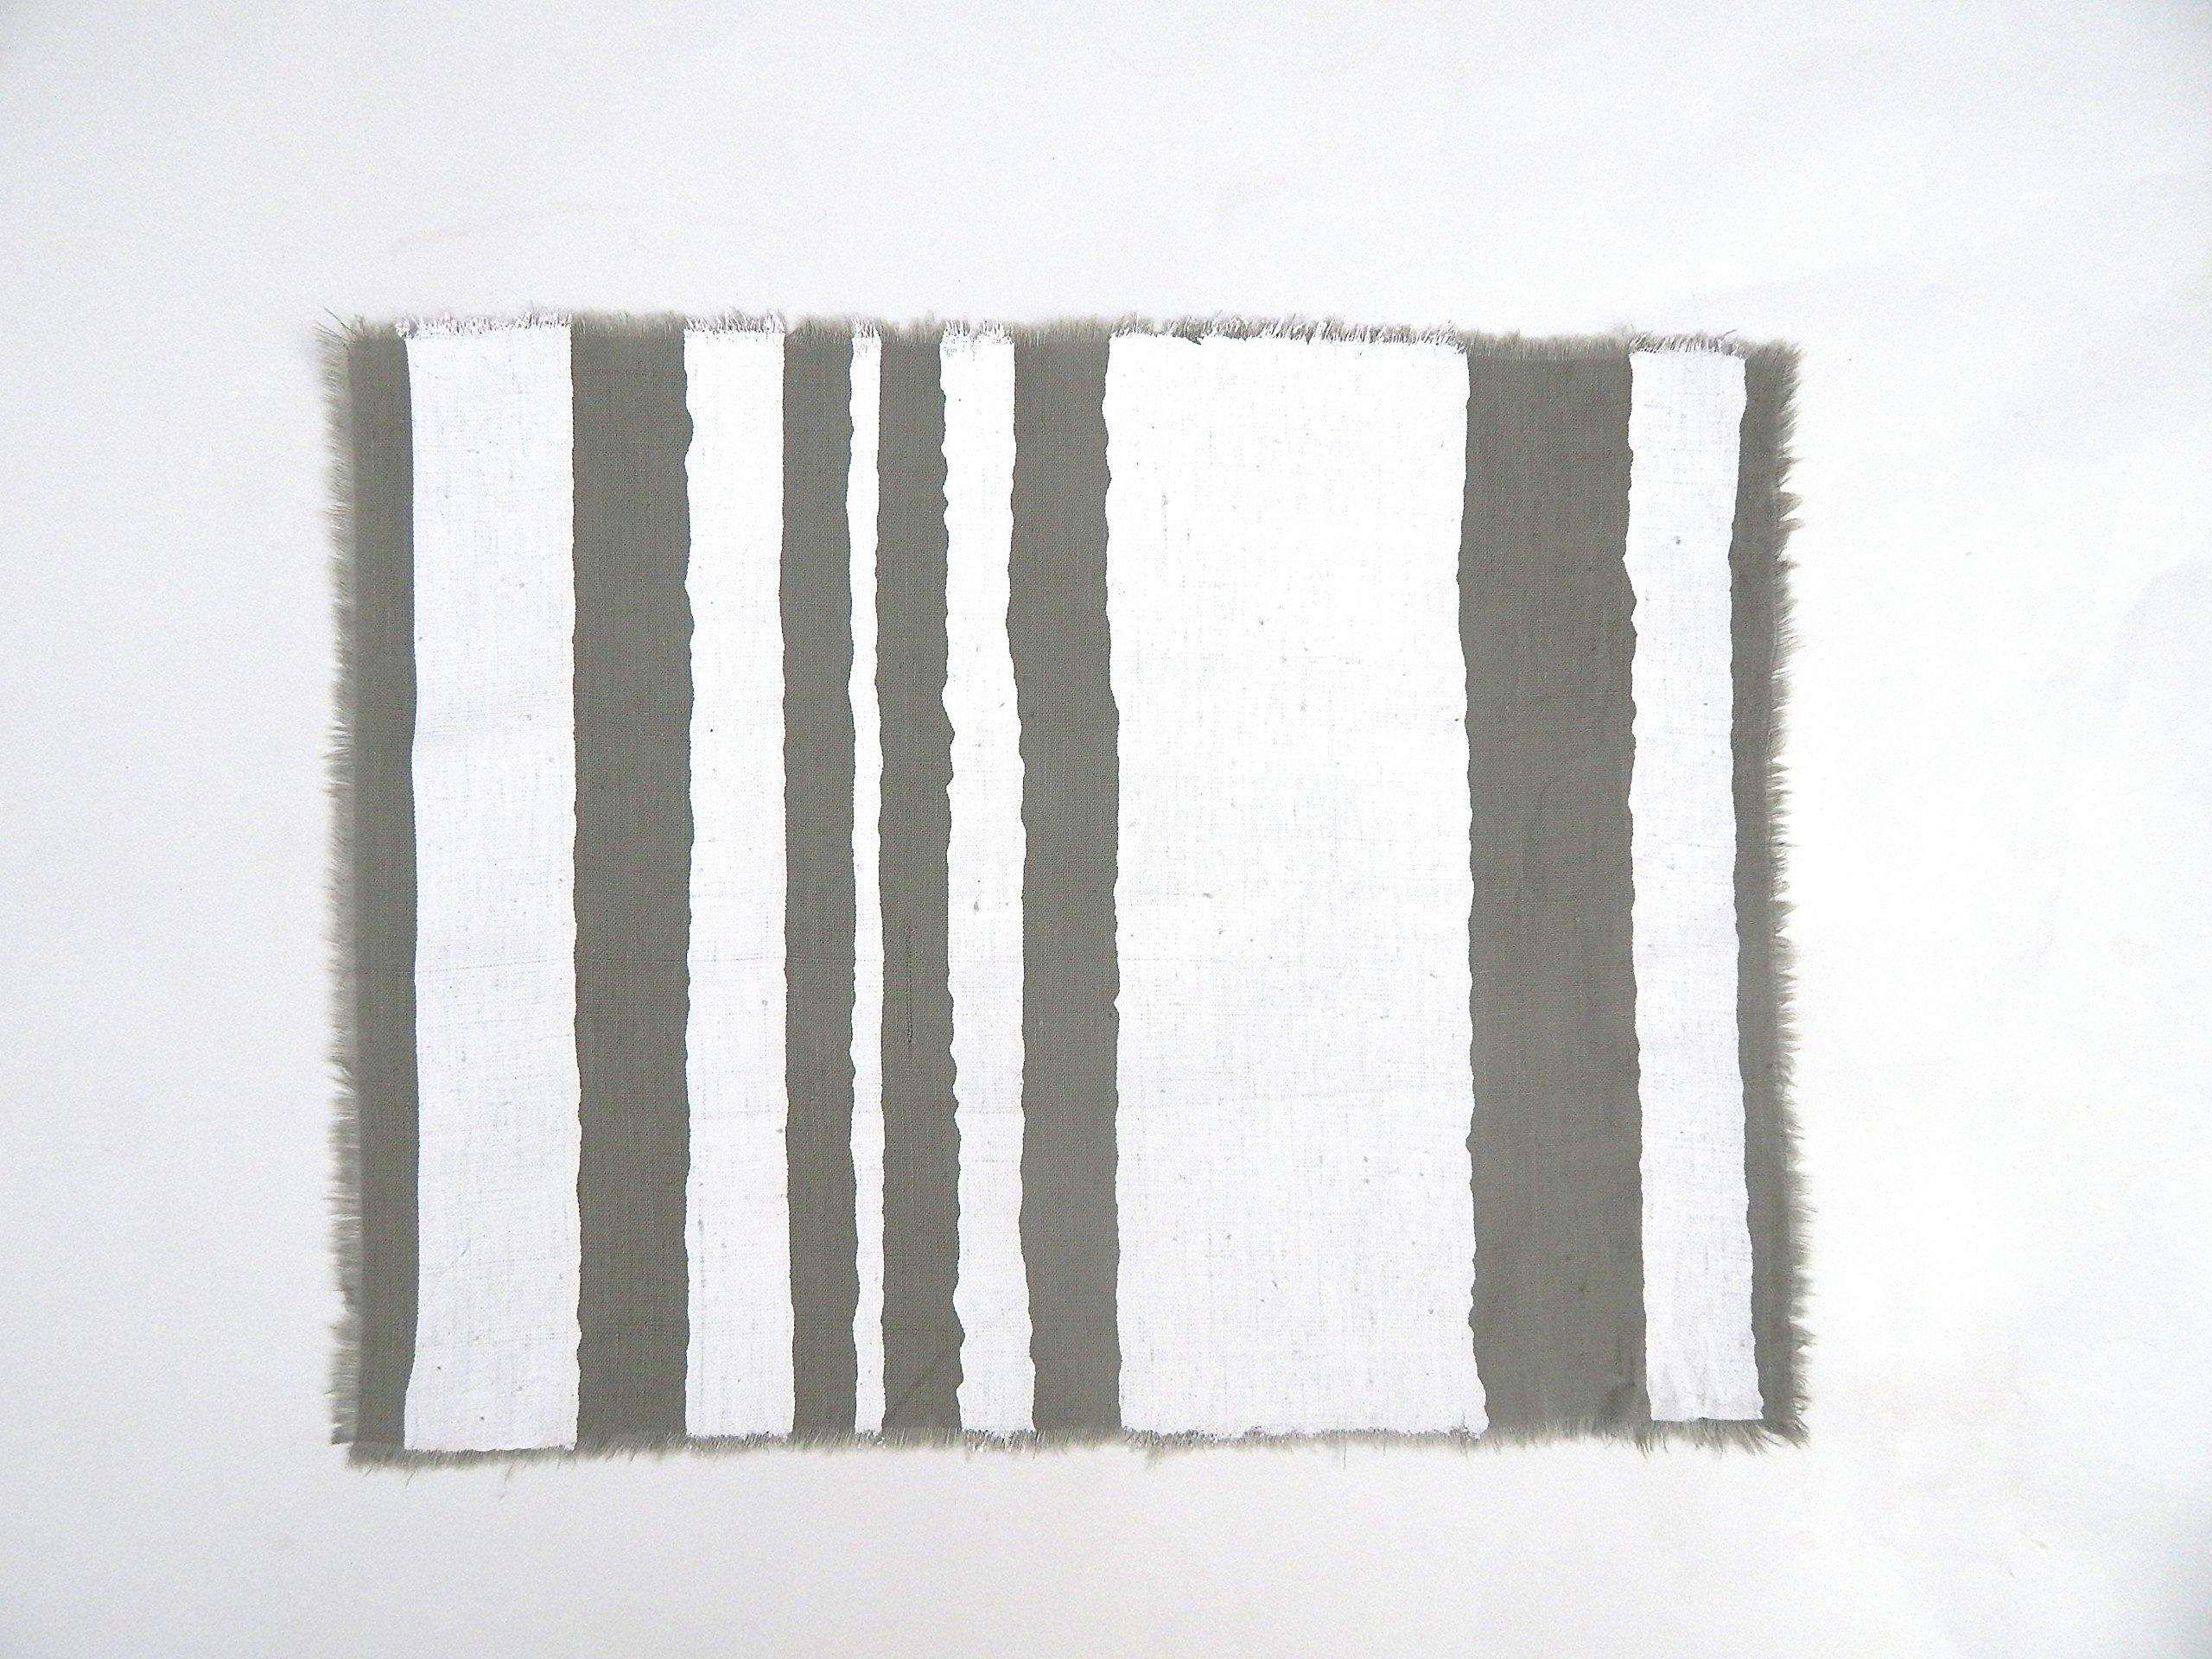 Gitika Goyal Home Windows Collection Cotton Khadi  Grey Mat 17x12 Wave Design, White Hand Screen Print